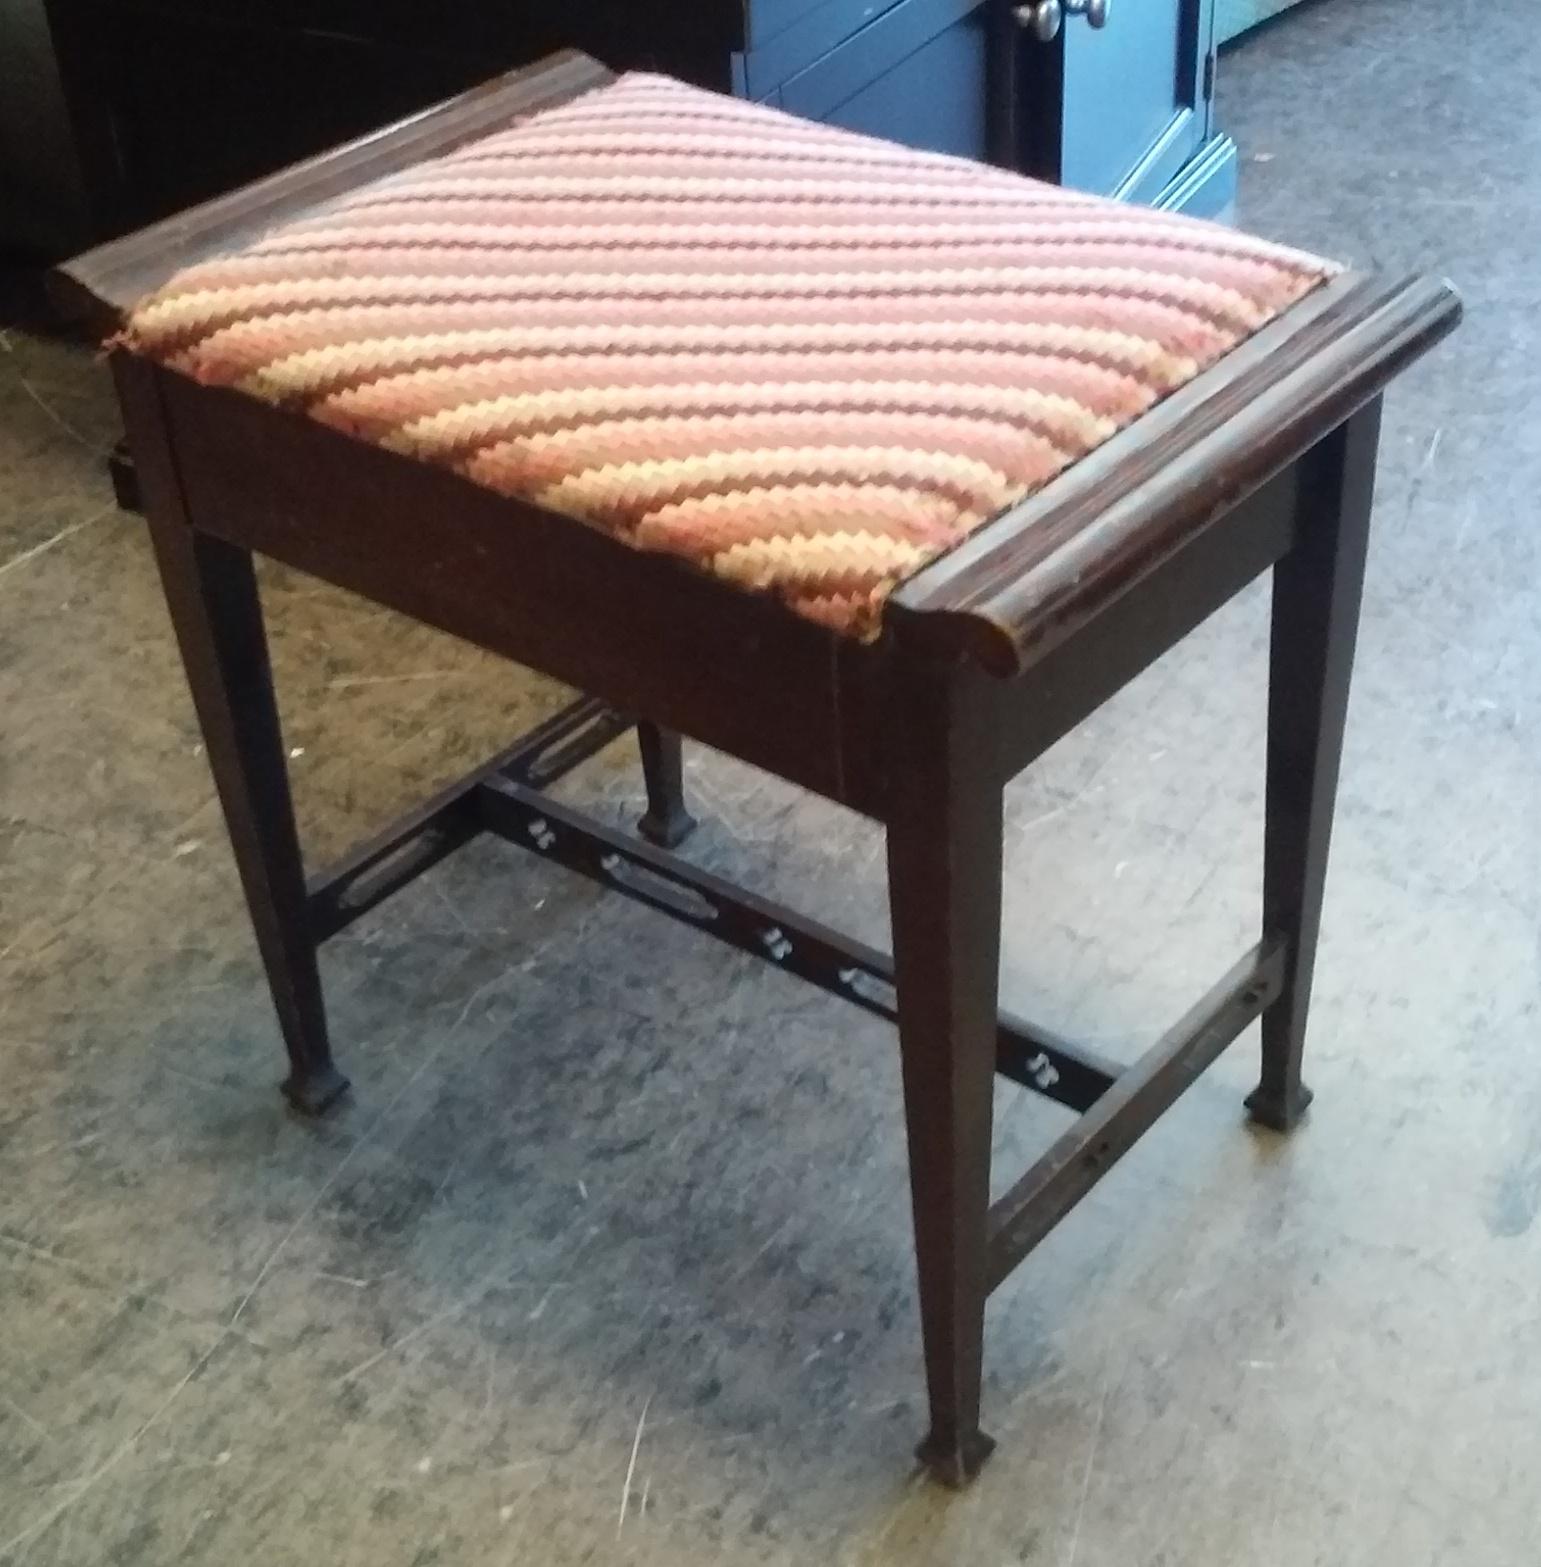 uhuru furniture collectibles sold vintage vanity bench with storage 30. Black Bedroom Furniture Sets. Home Design Ideas